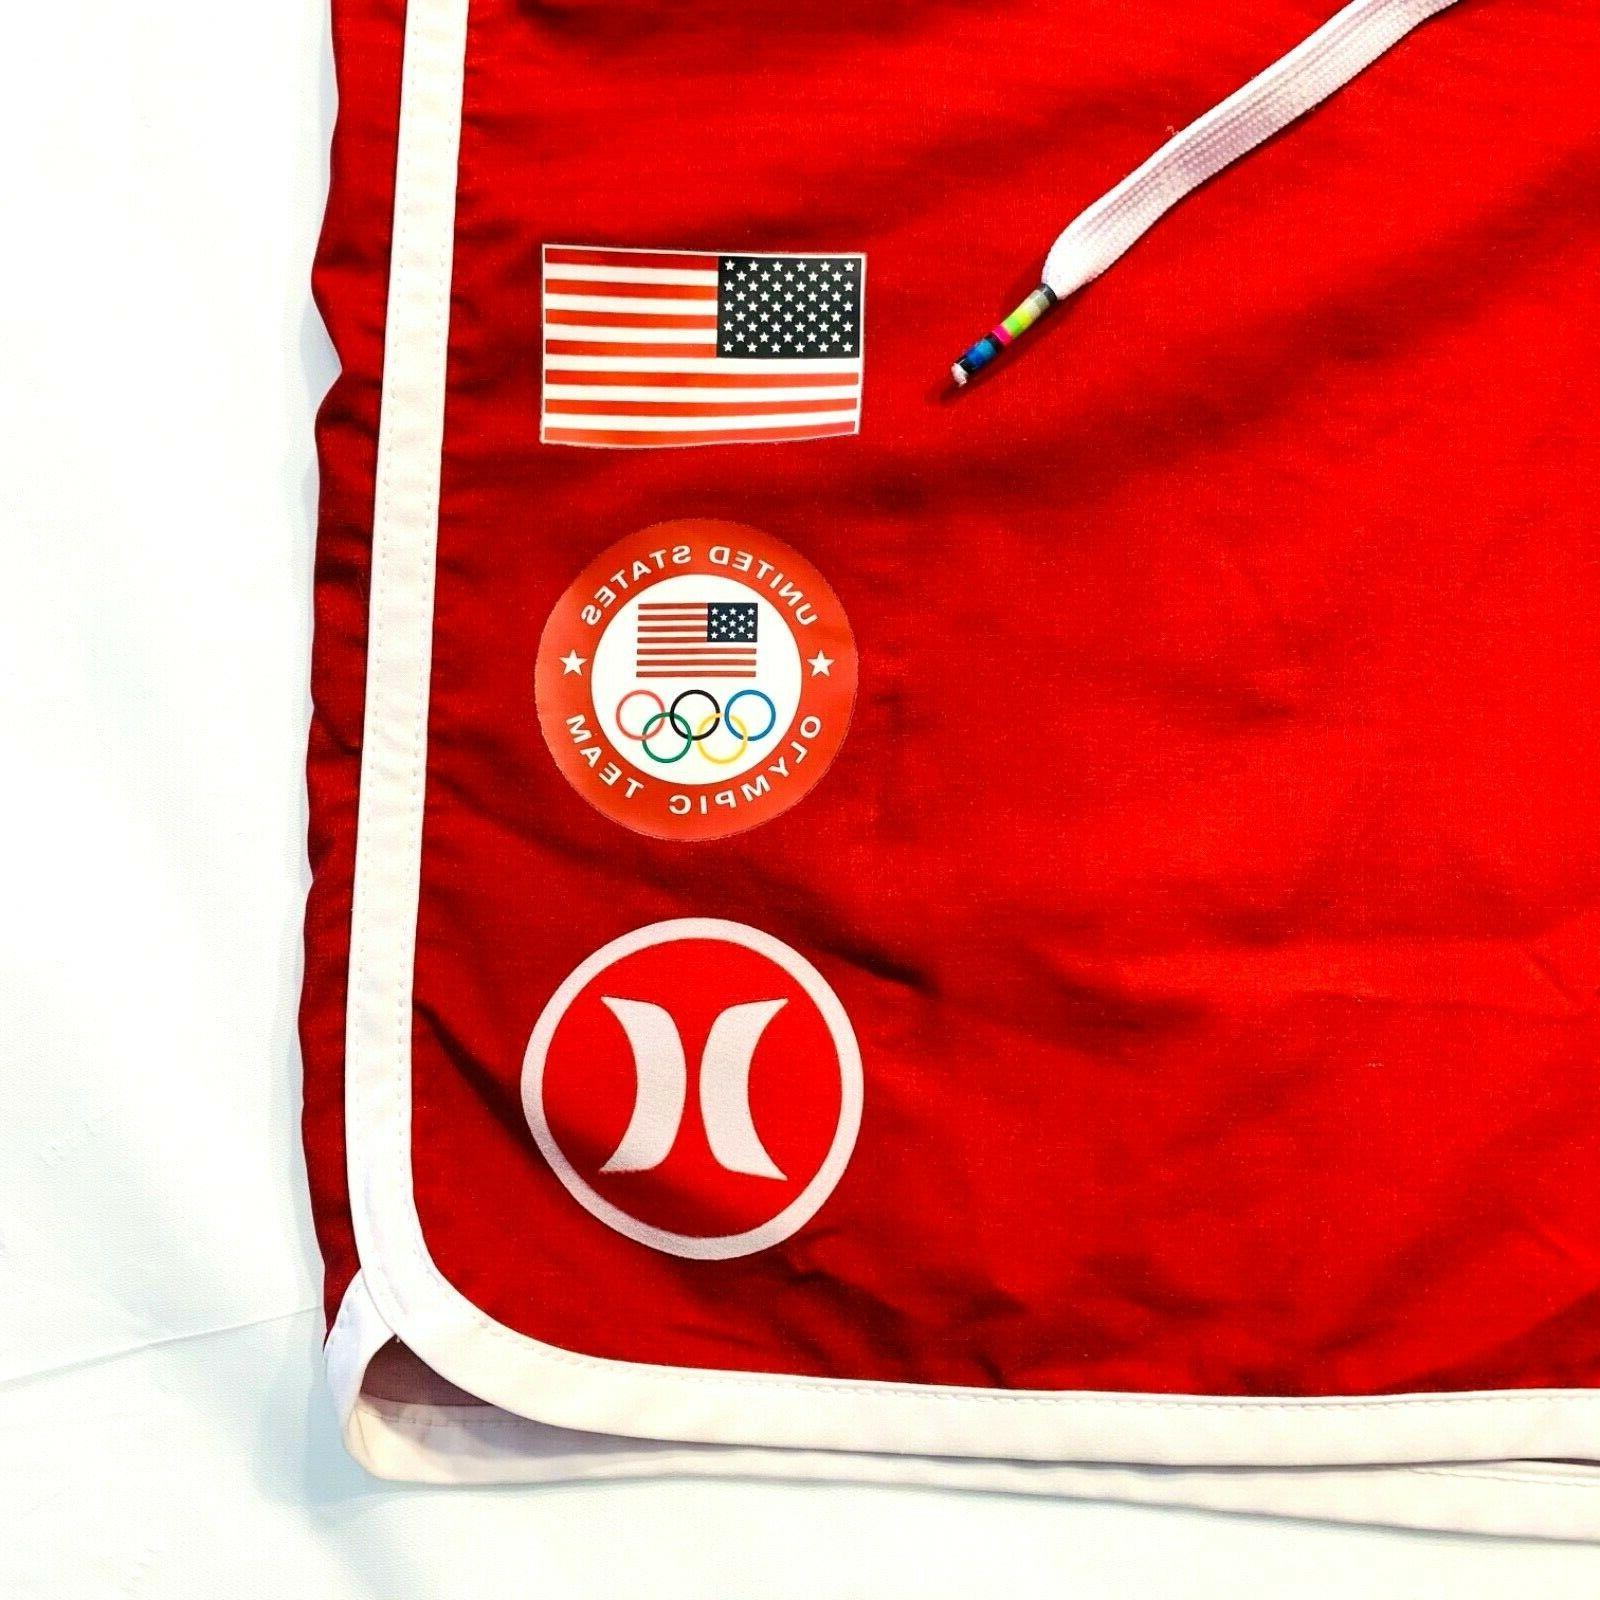 HURLEY Phantom USA Olympic Team Luxury